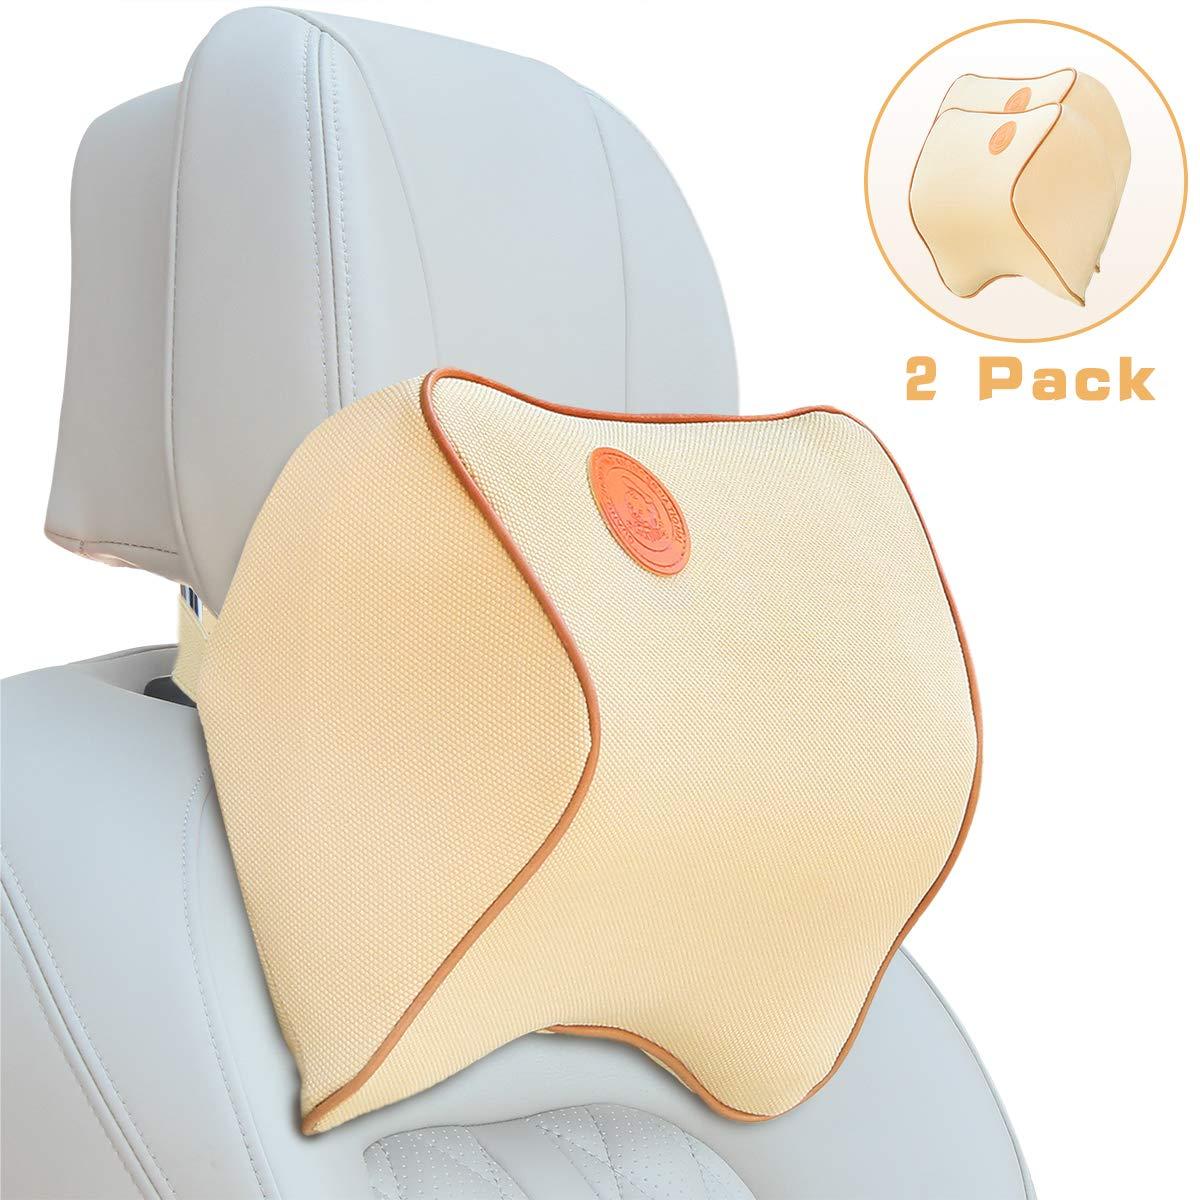 FLY OCEAN Headrest seat Headrest Comfortable